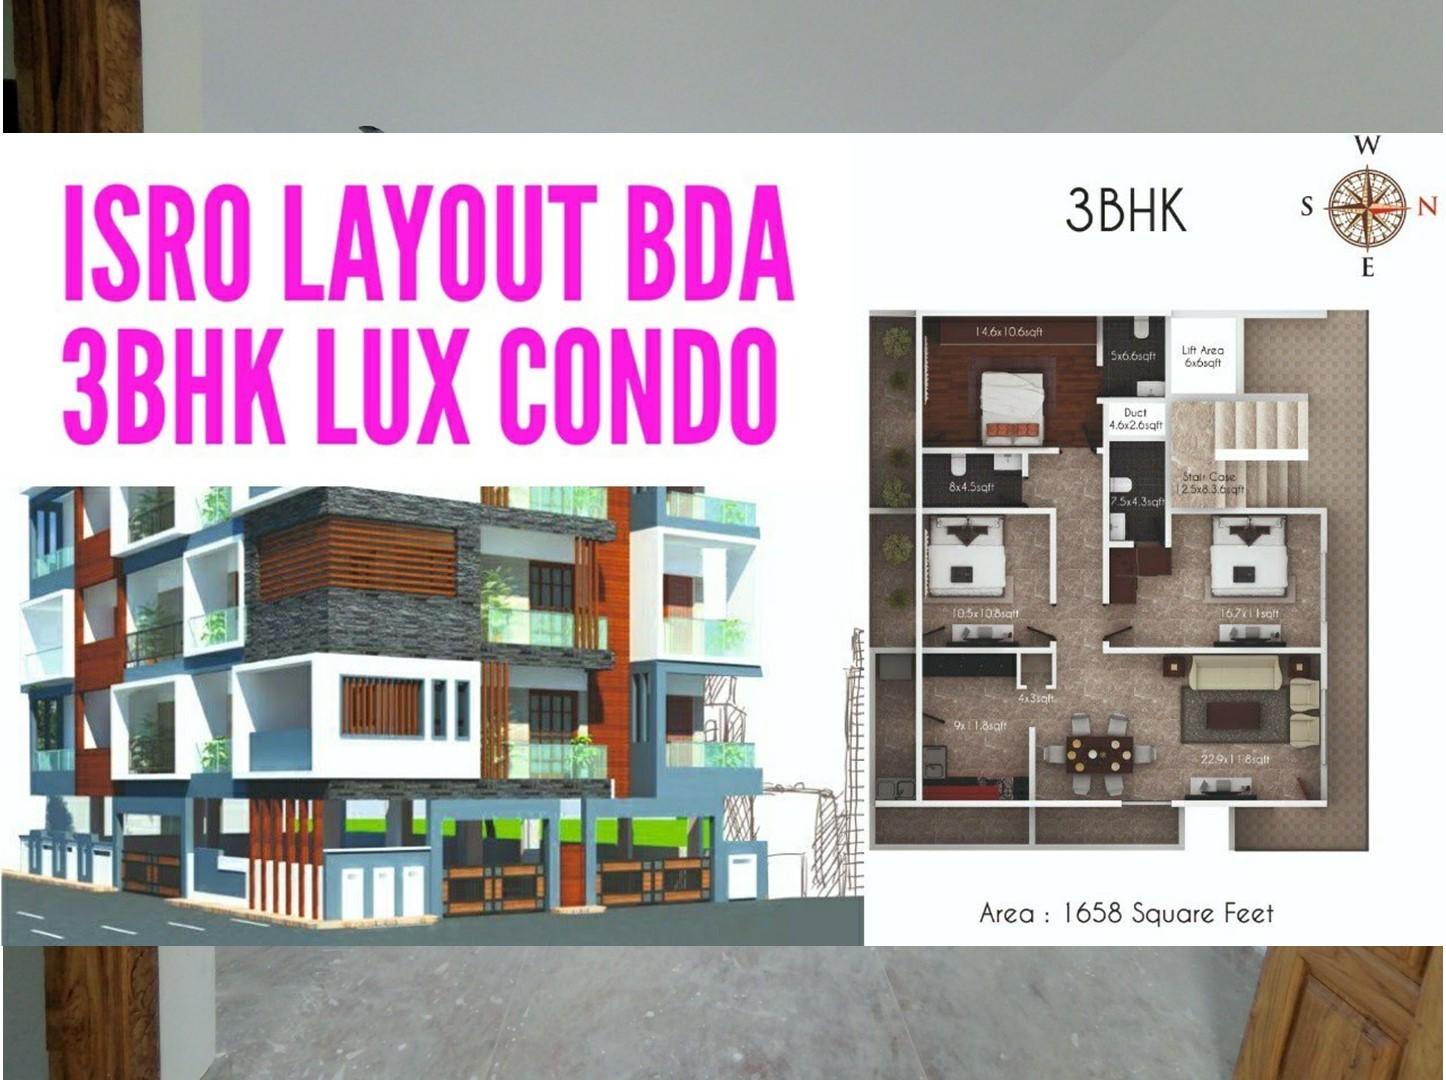 ISRO Layout Banashankari BDA – 3BHK Exclusive Condo For Sale – Corner Flat with 4 Balconies